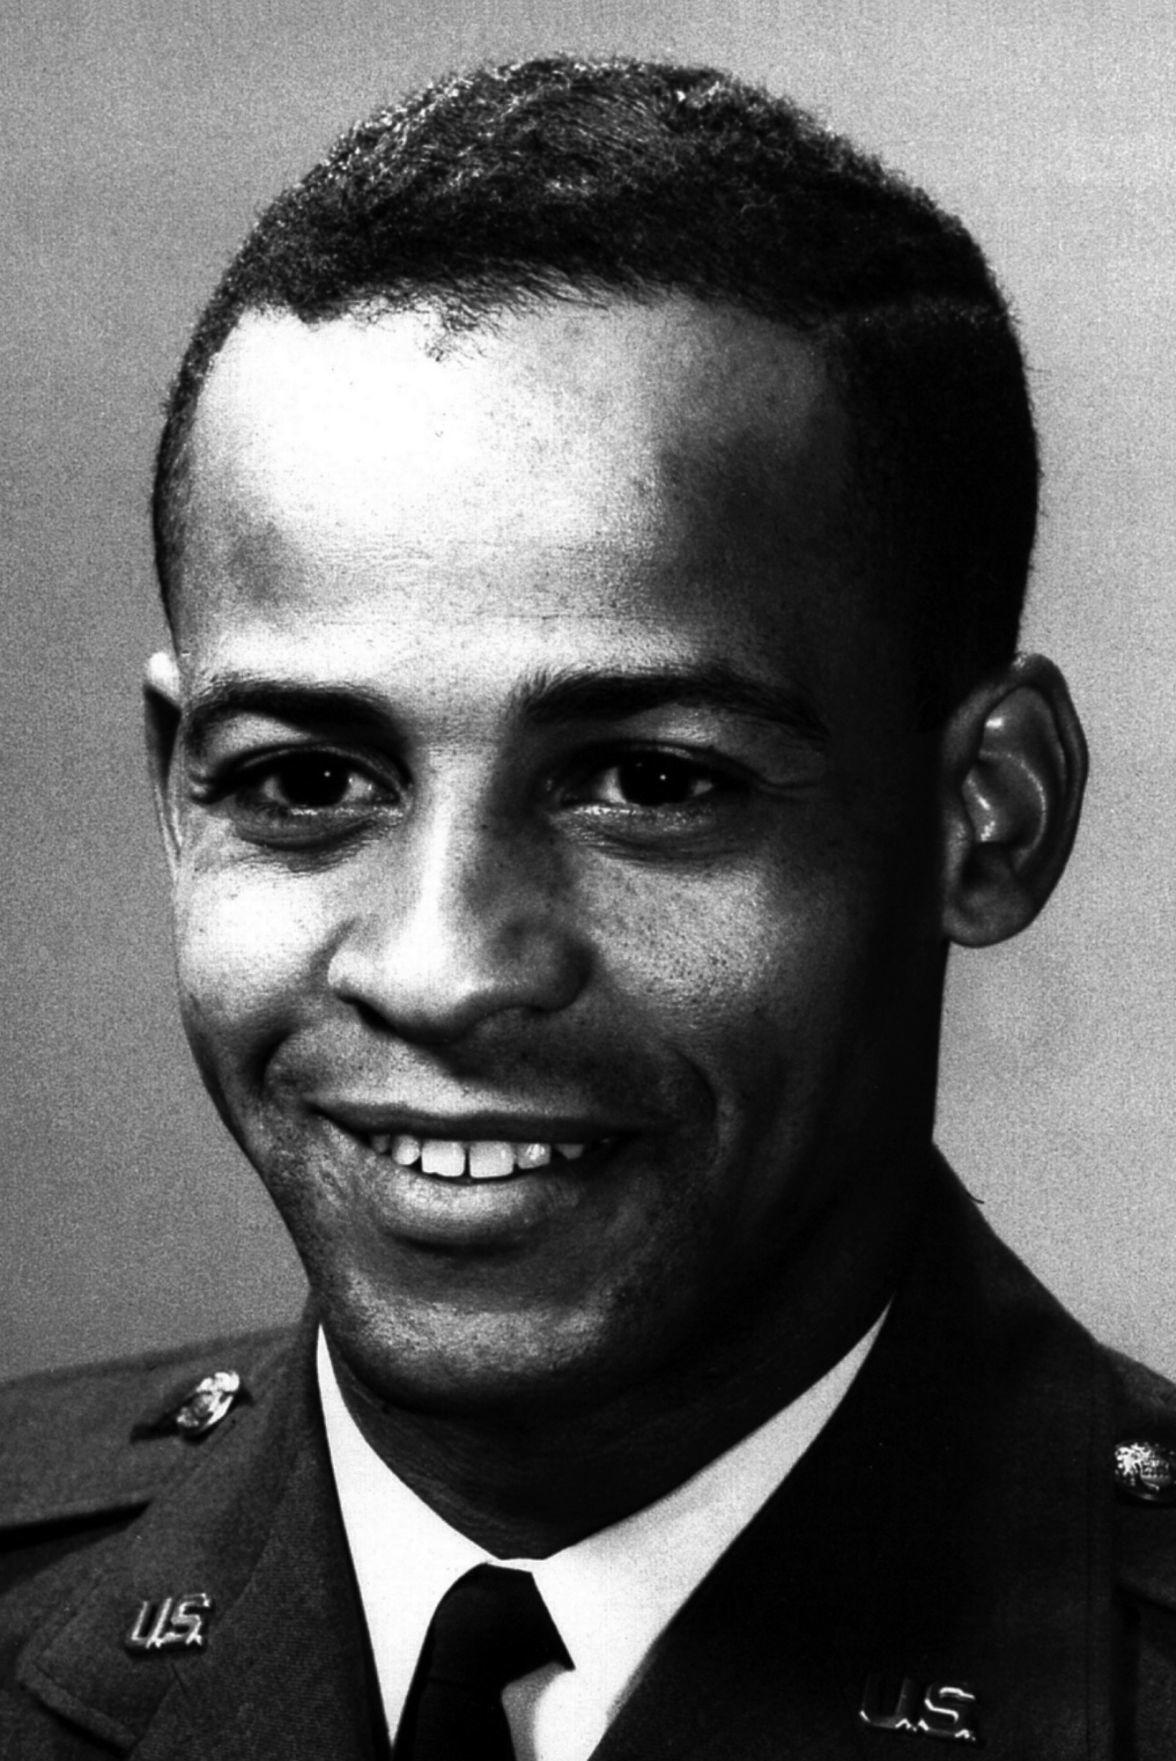 Ed Dwight, U.S. Air Force portrait